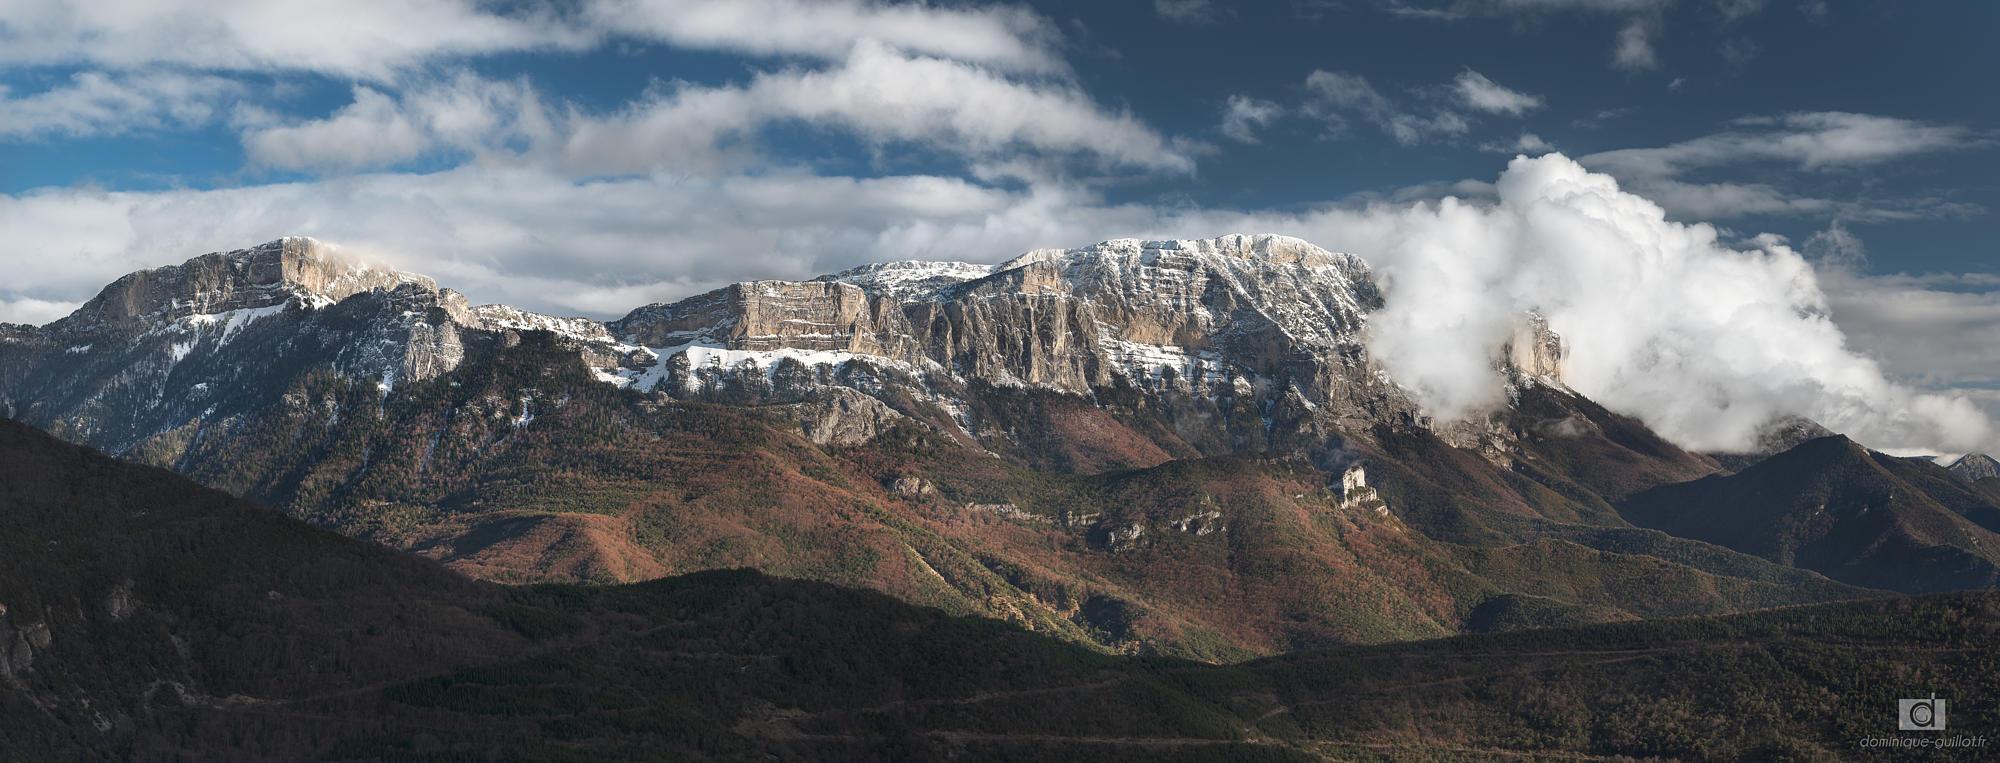 Montagne du Glandasse